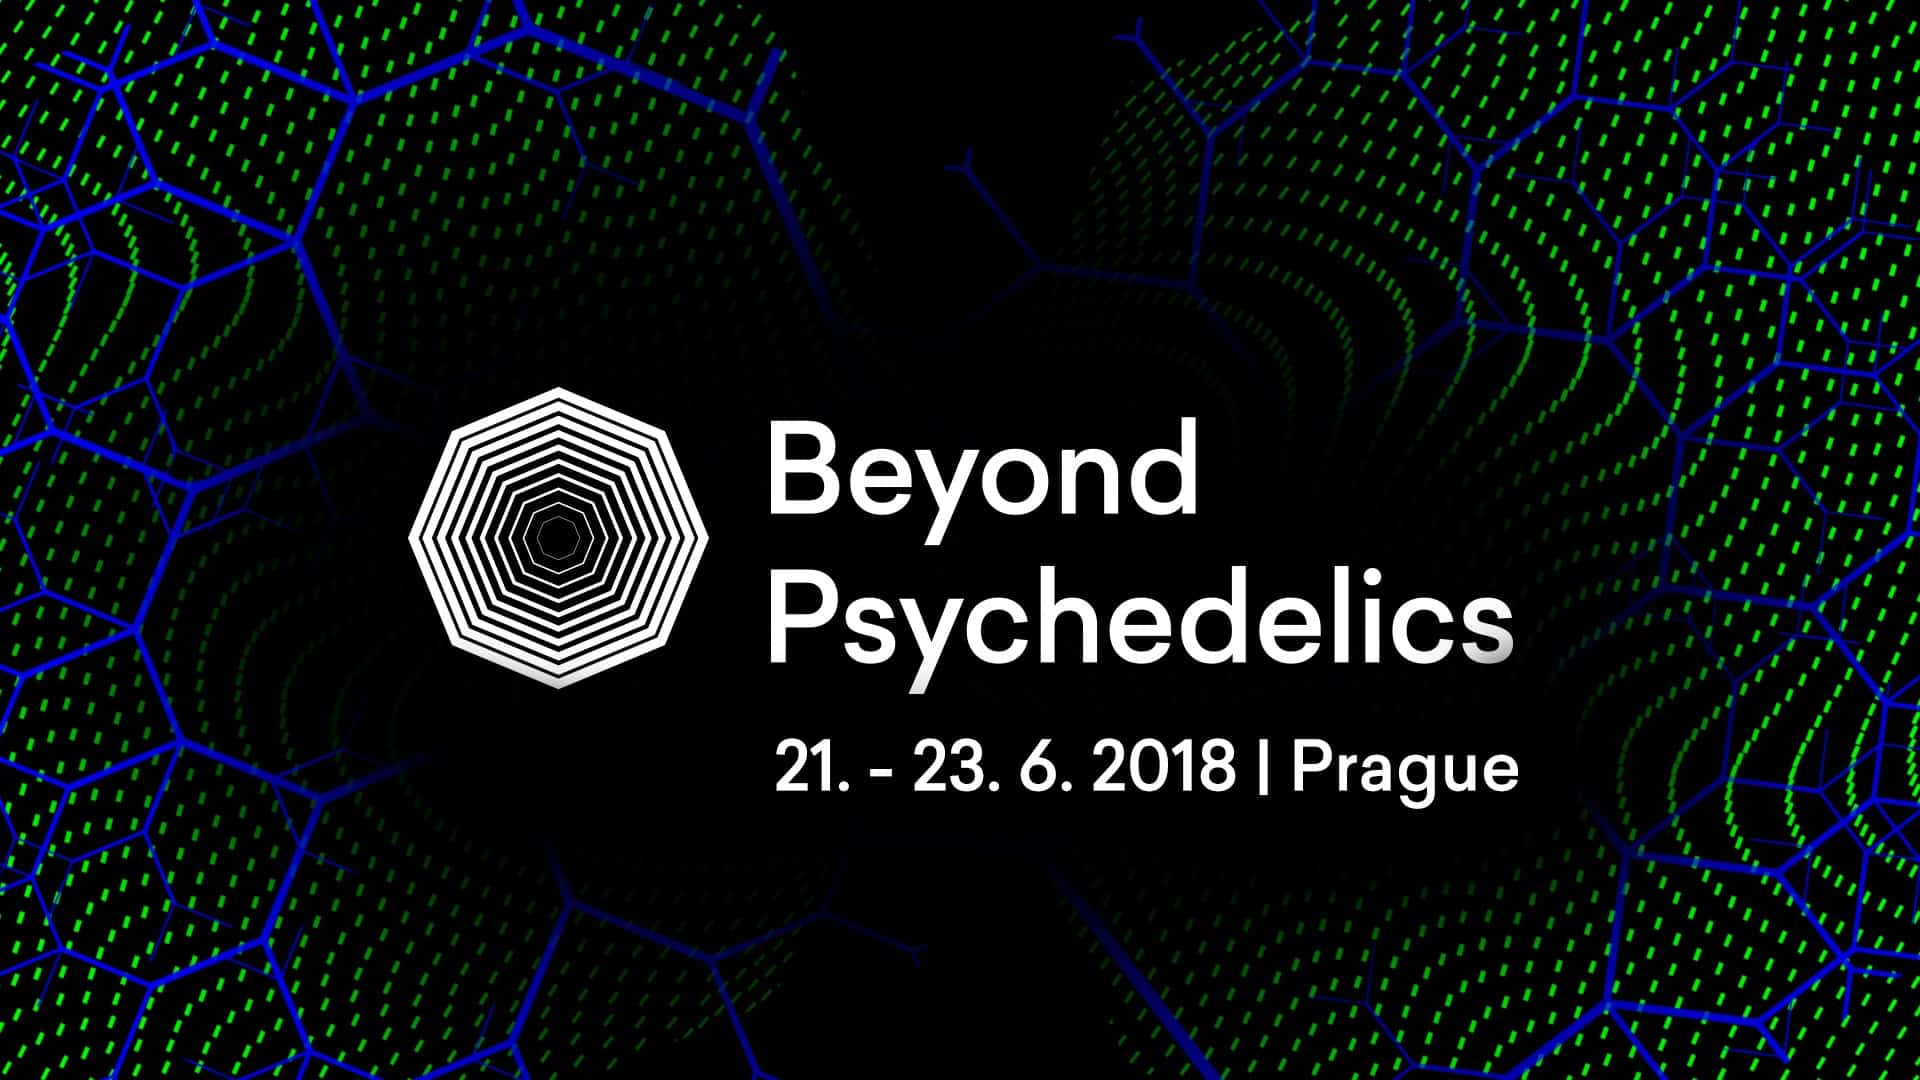 Beyond-Psychedelics-2018.jpg